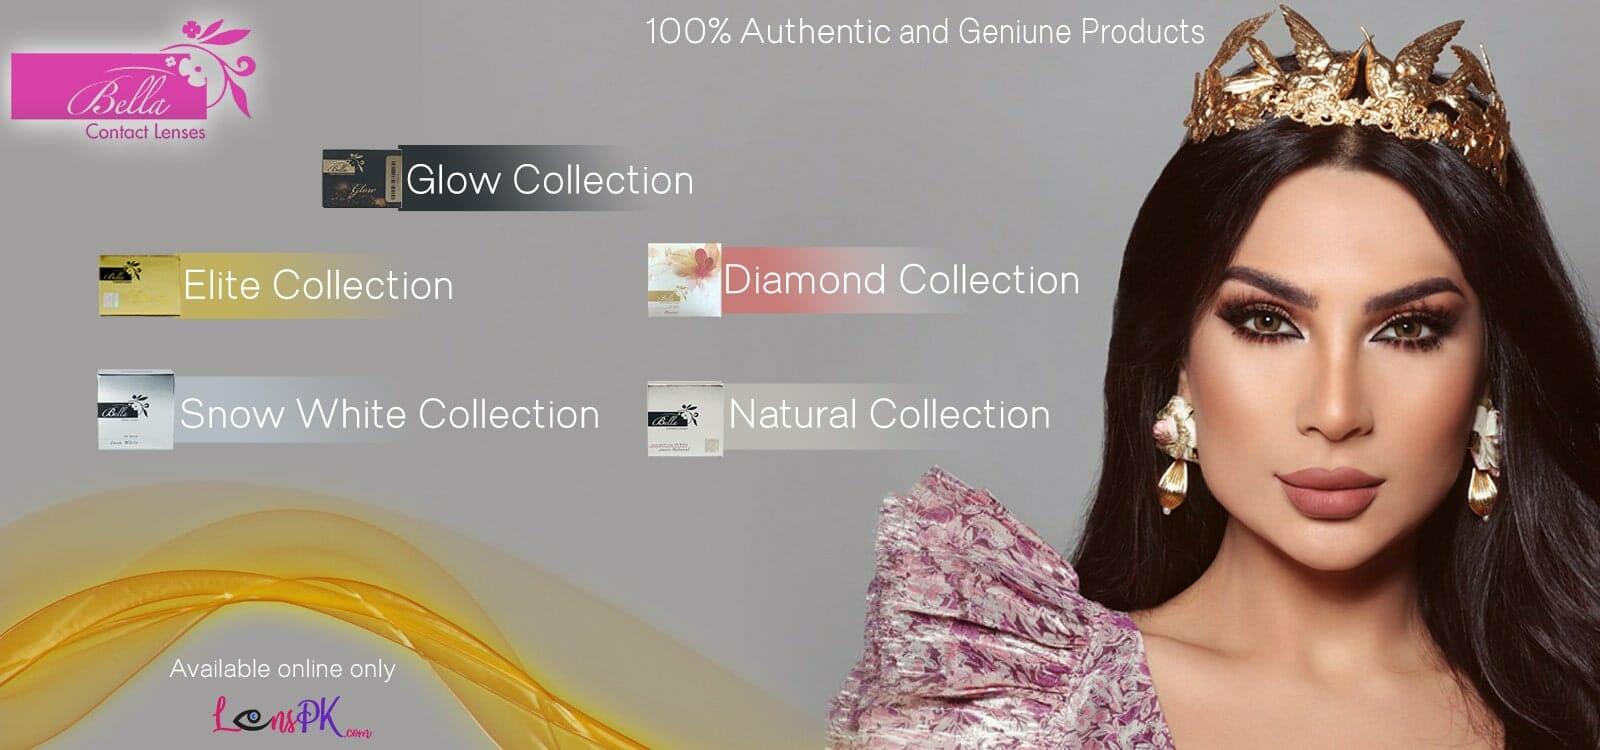 Buy Complete range of Bella Contact Lenses Online - lenspk.com